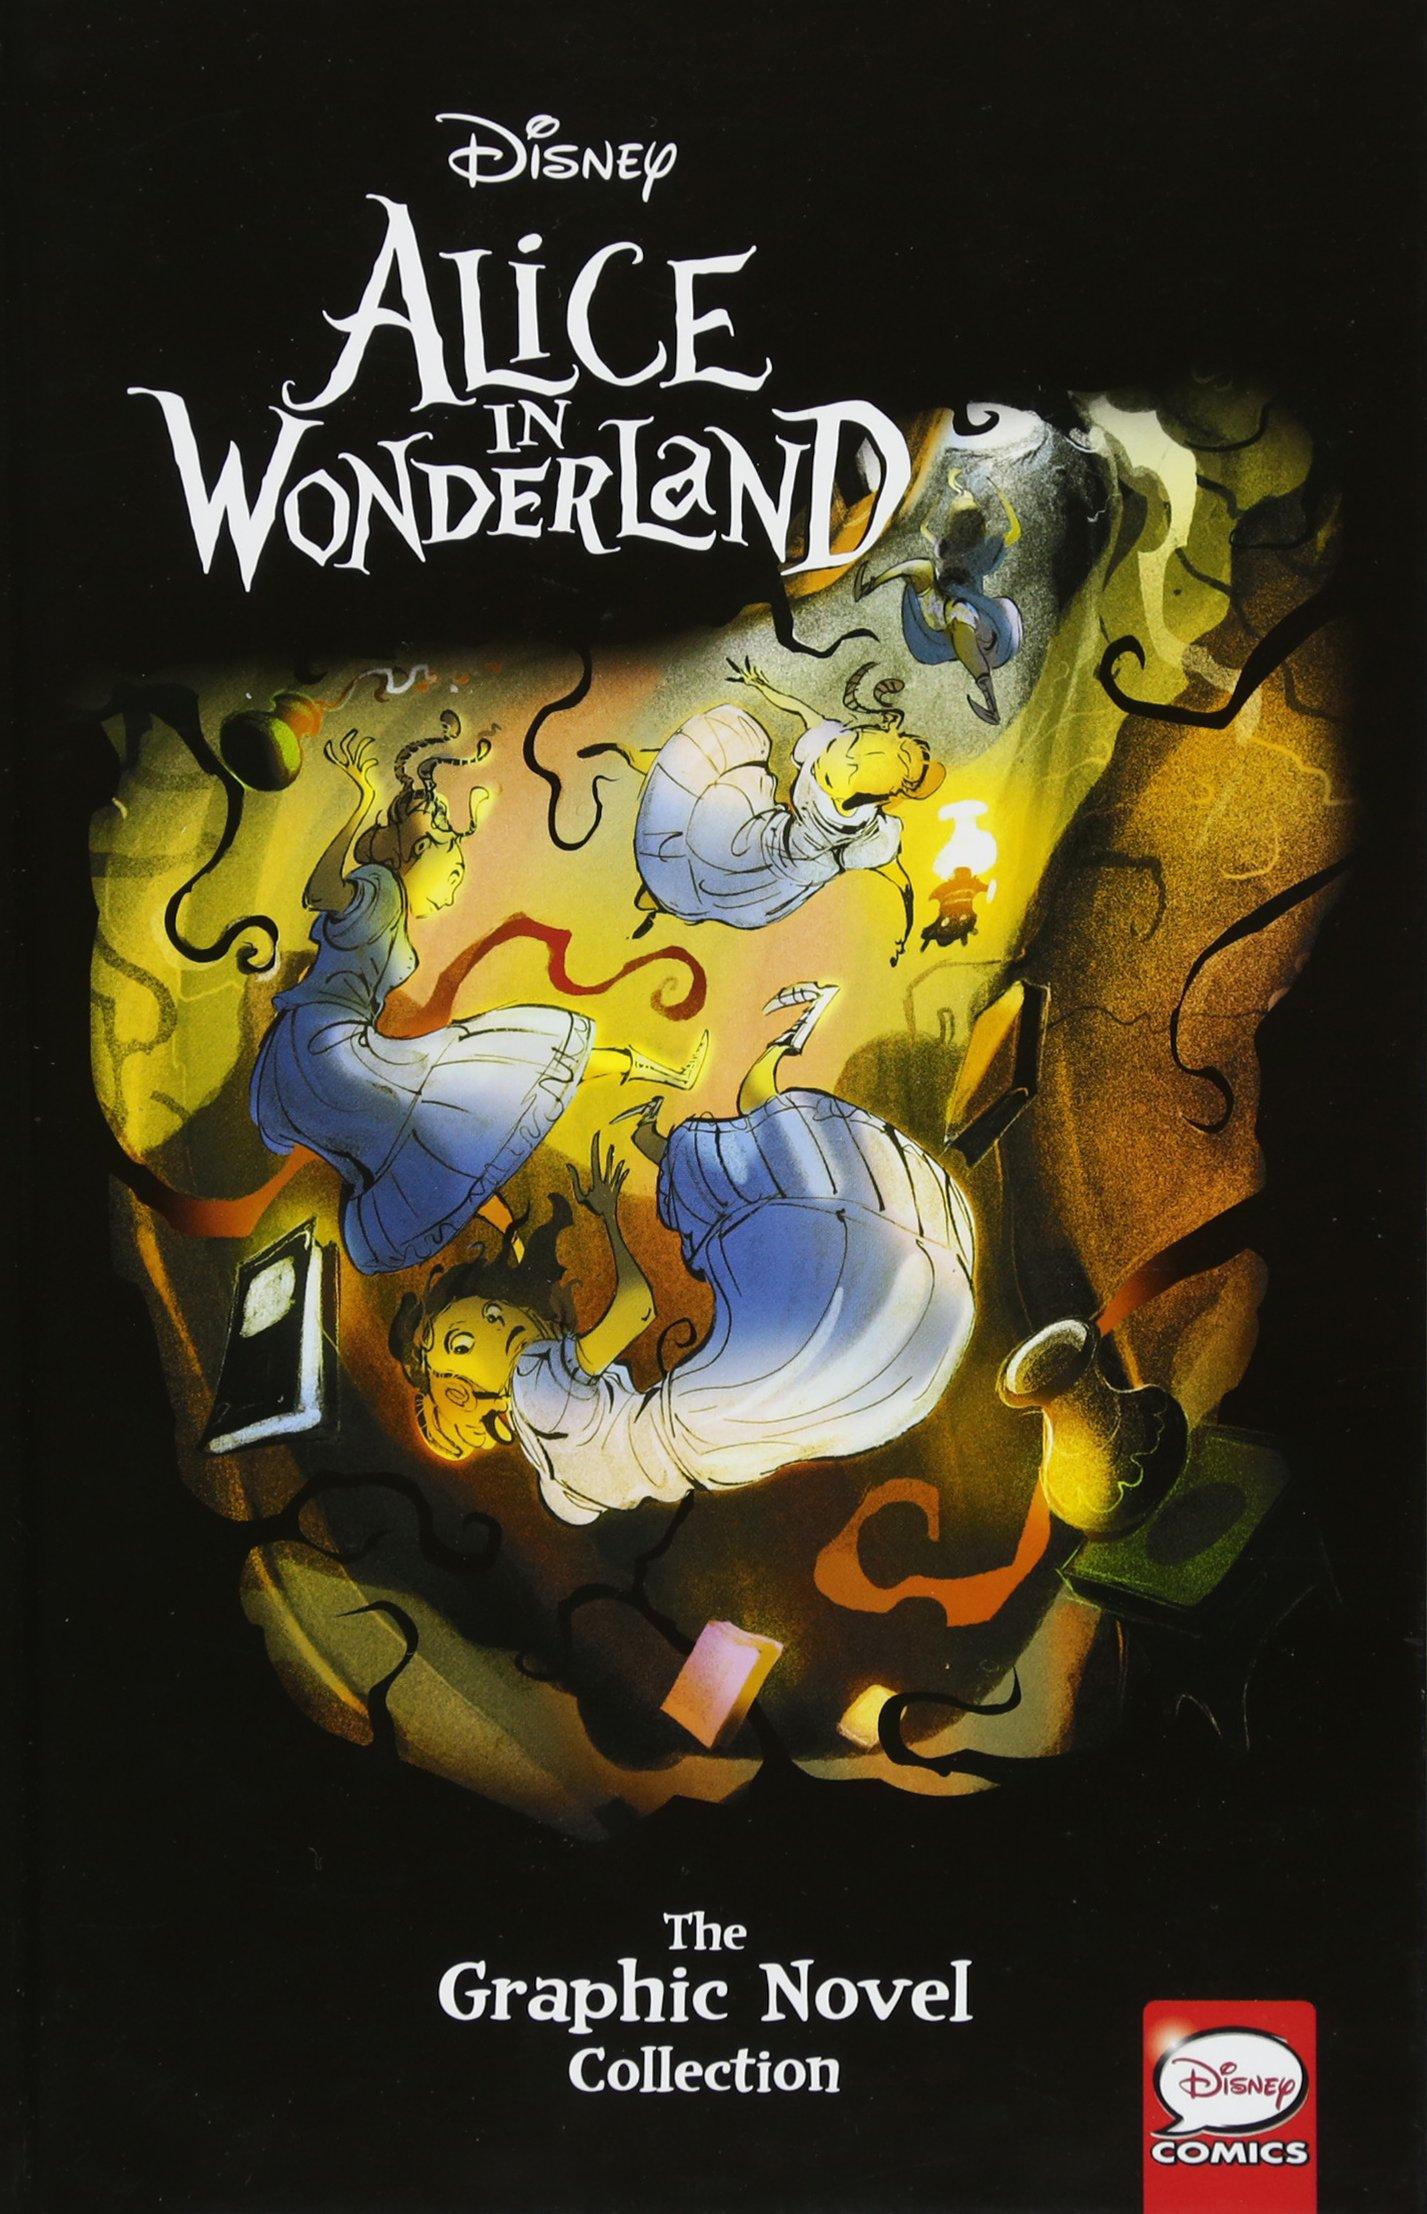 Disney Alice in Wonderland: The Graphic Novel Collection (Disney Comics)